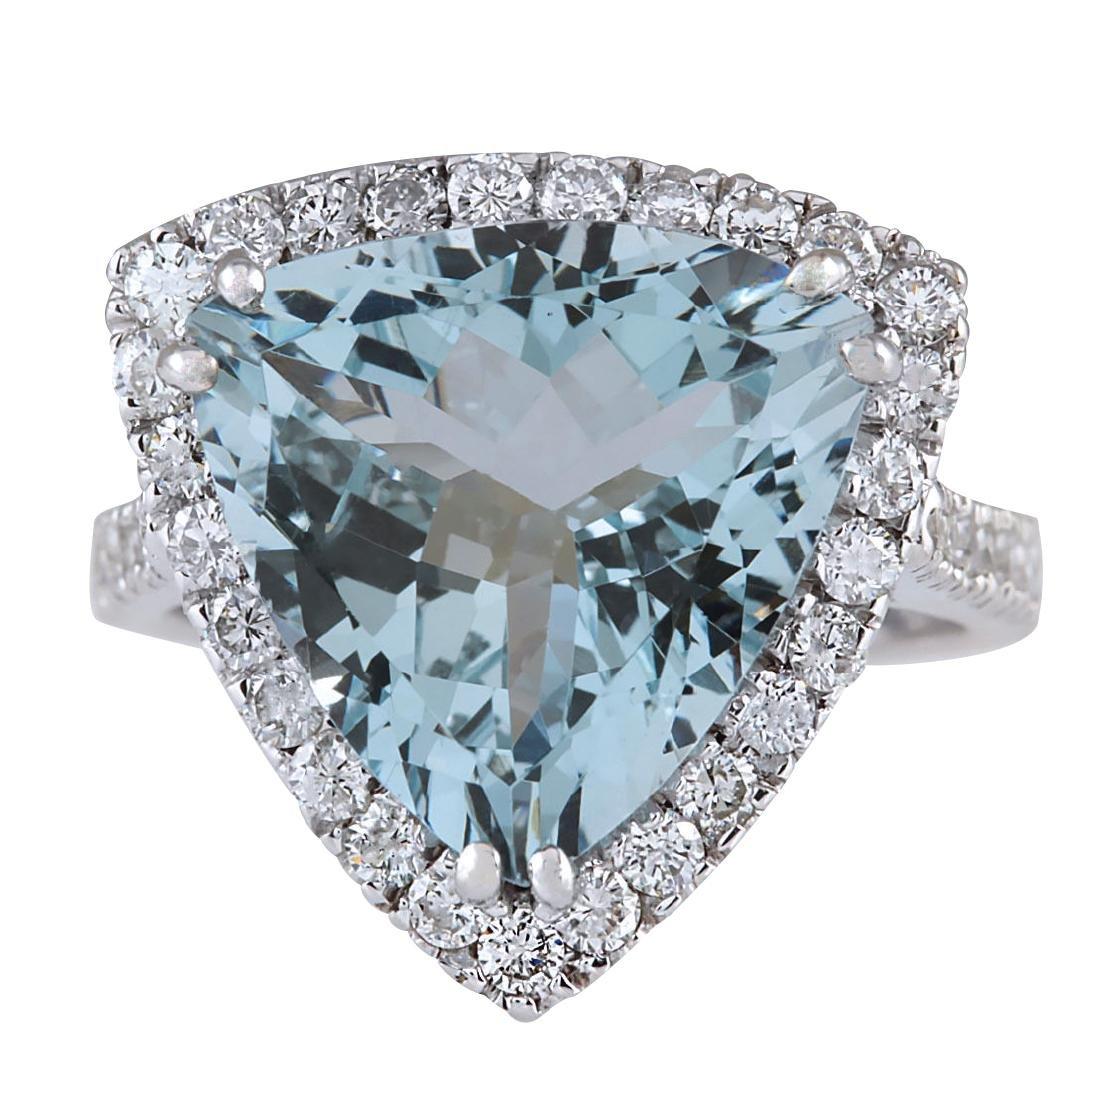 7.75CTW Natural Aquamarine And Diamond Ring In 14K